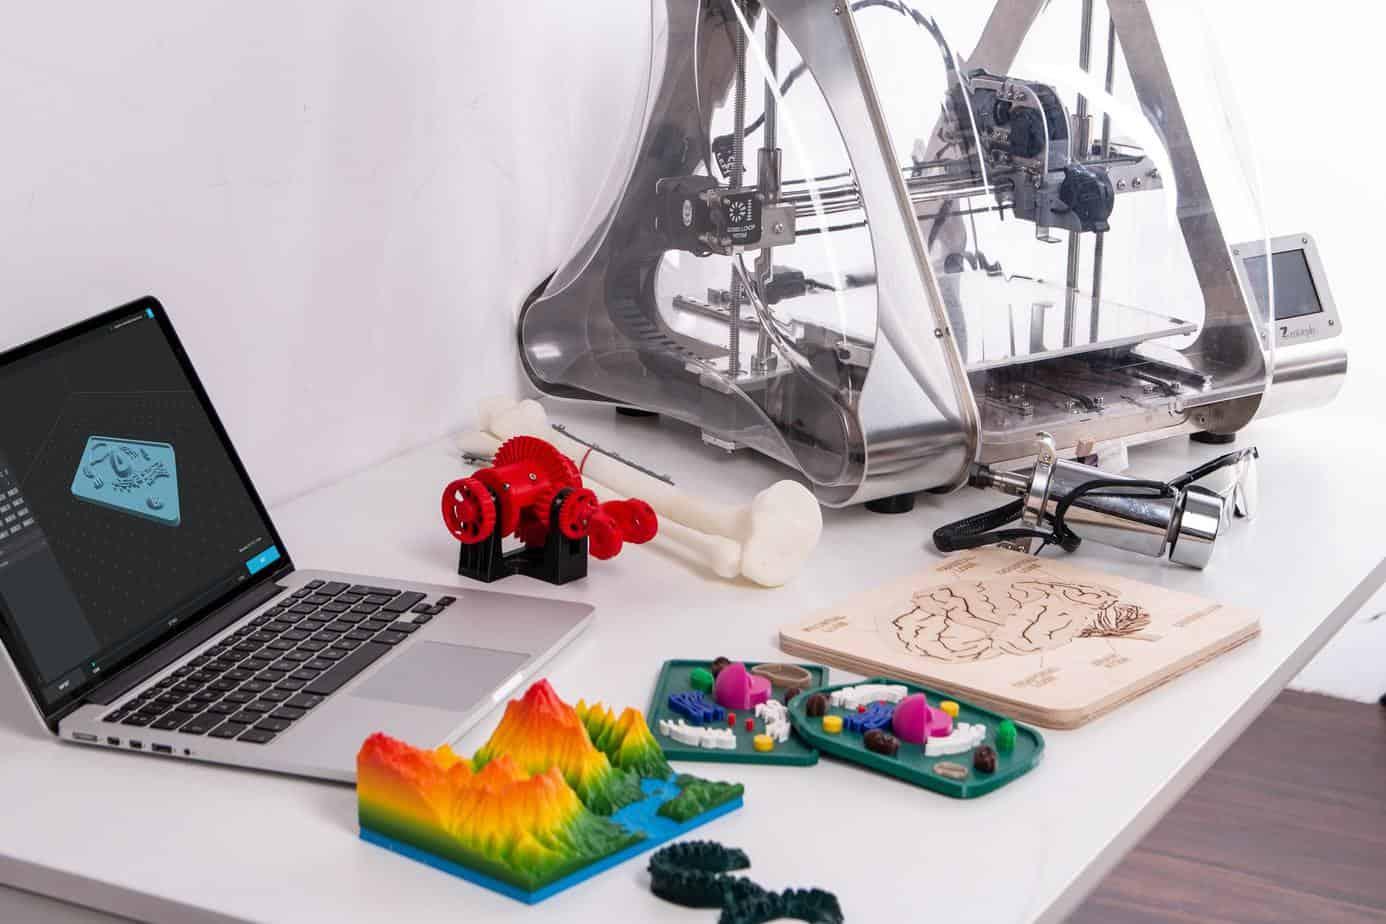 What is an SLA 3D printer